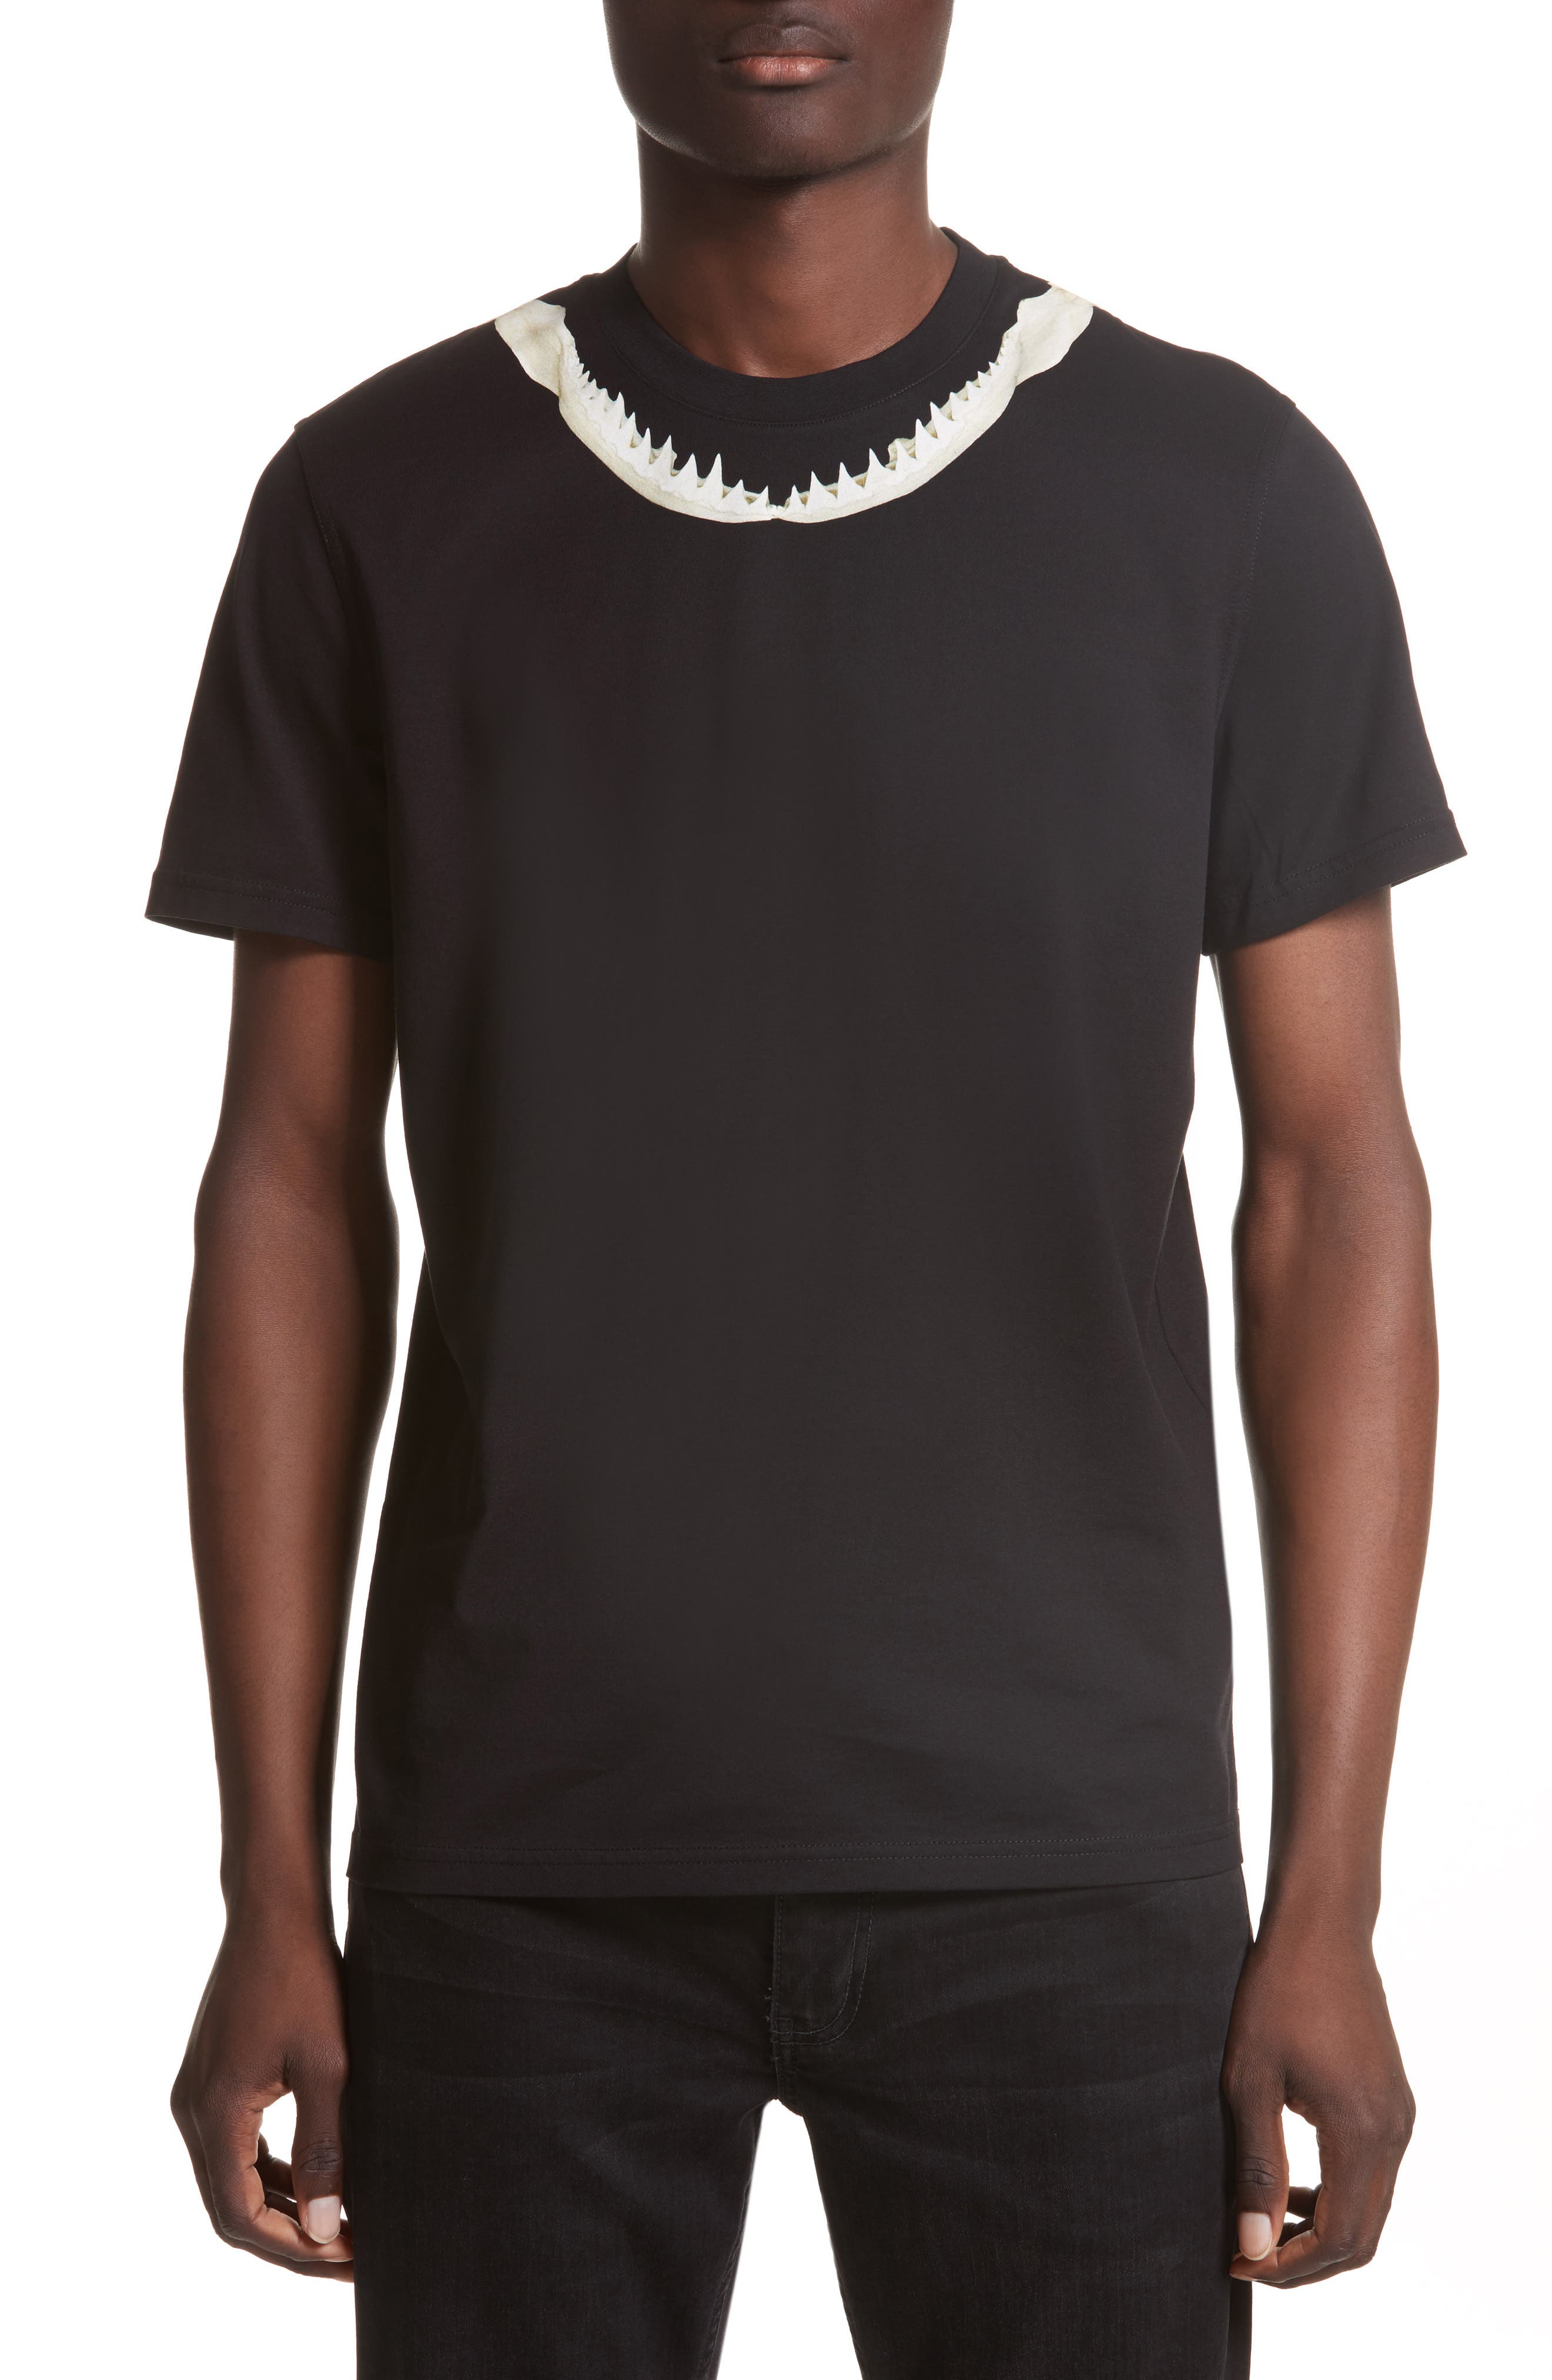 Alternate Image 1 Selected - Givenchy Cuban Fit Shark Print T-Shirt